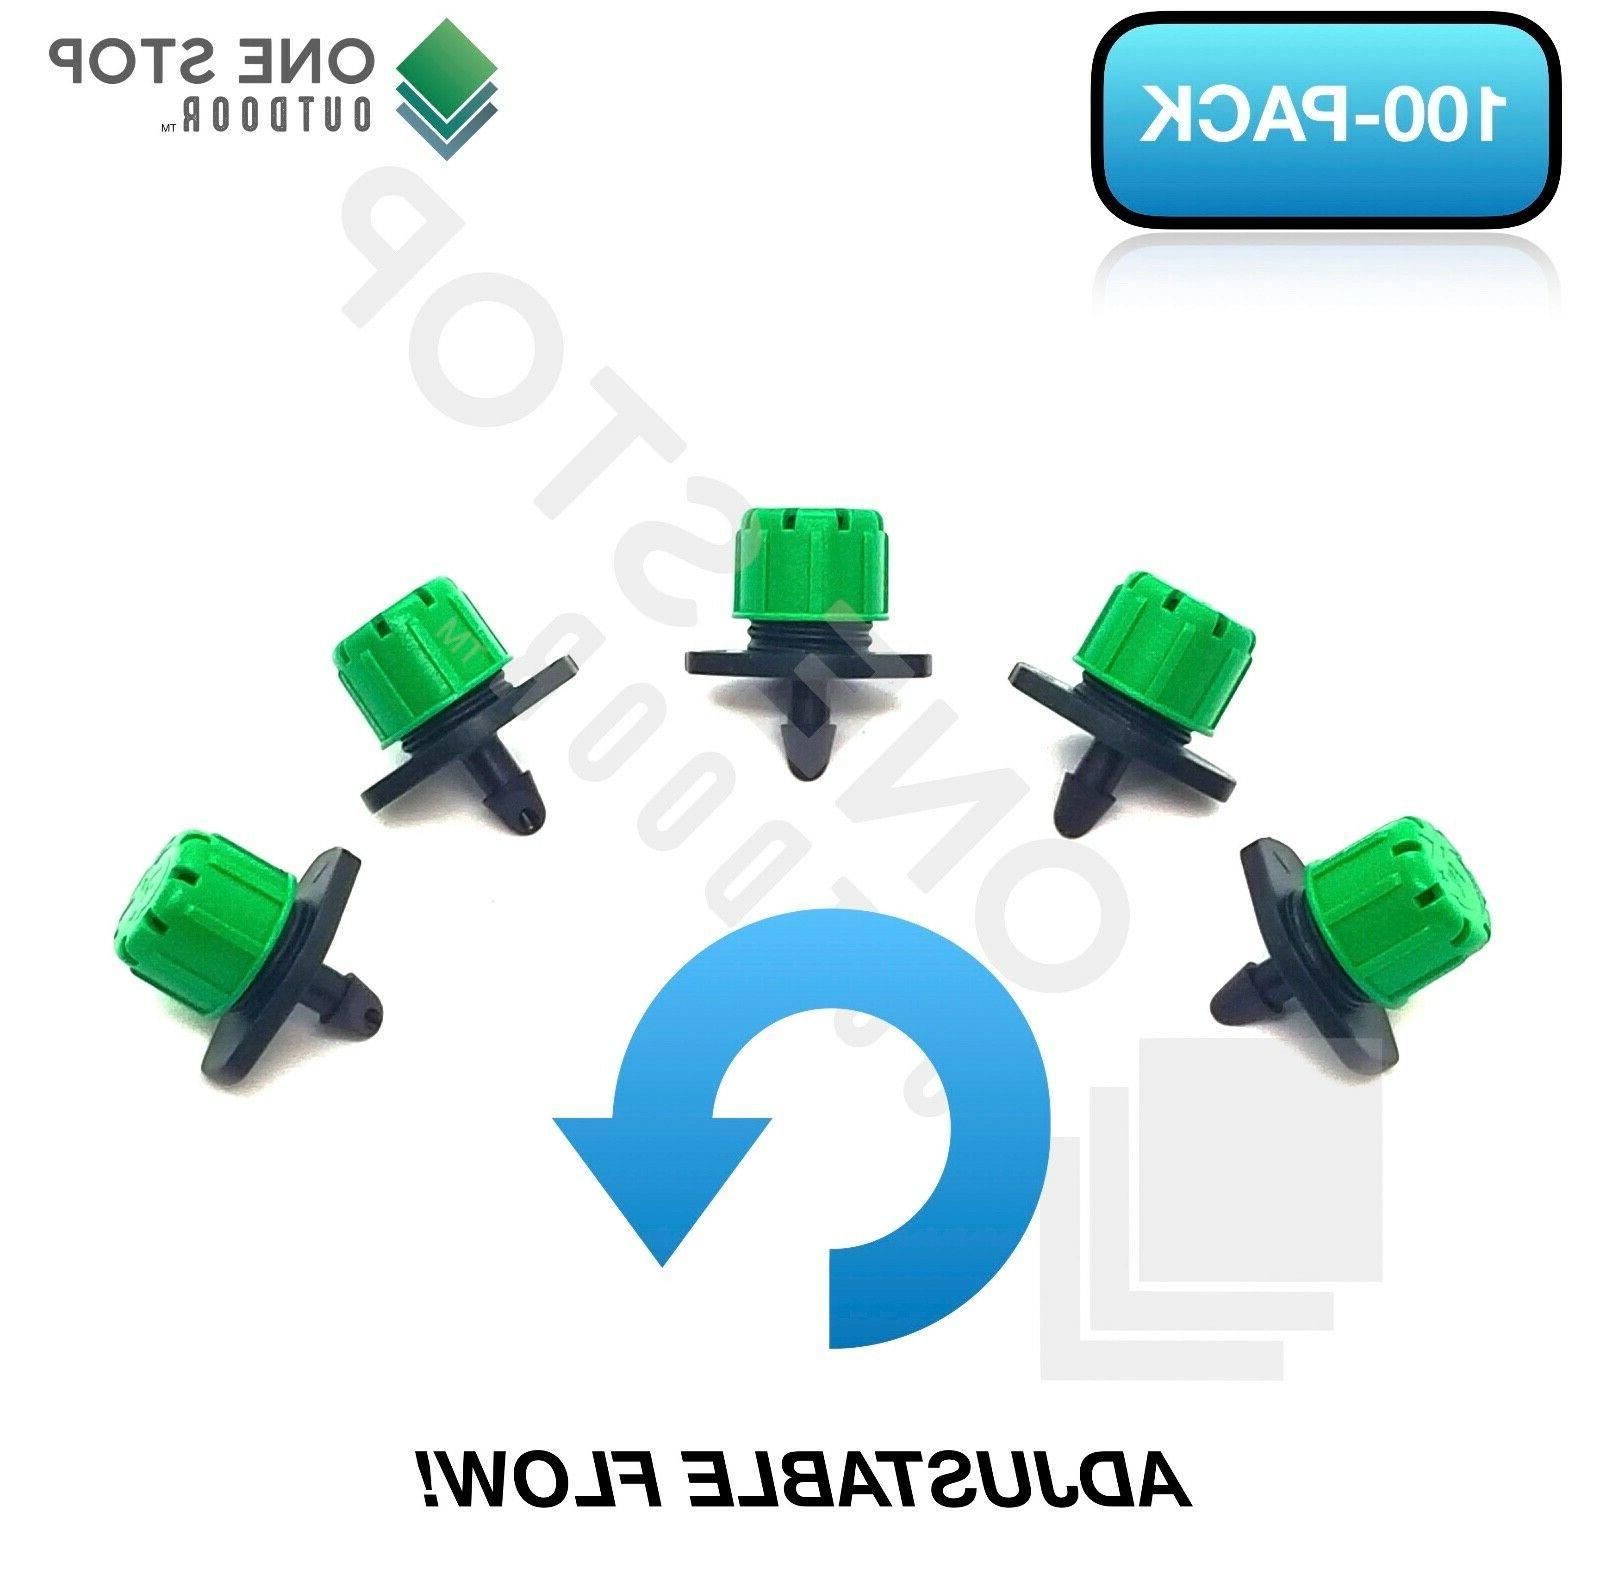 100Pc Adjustable Emitter Micro Irrigation Watering